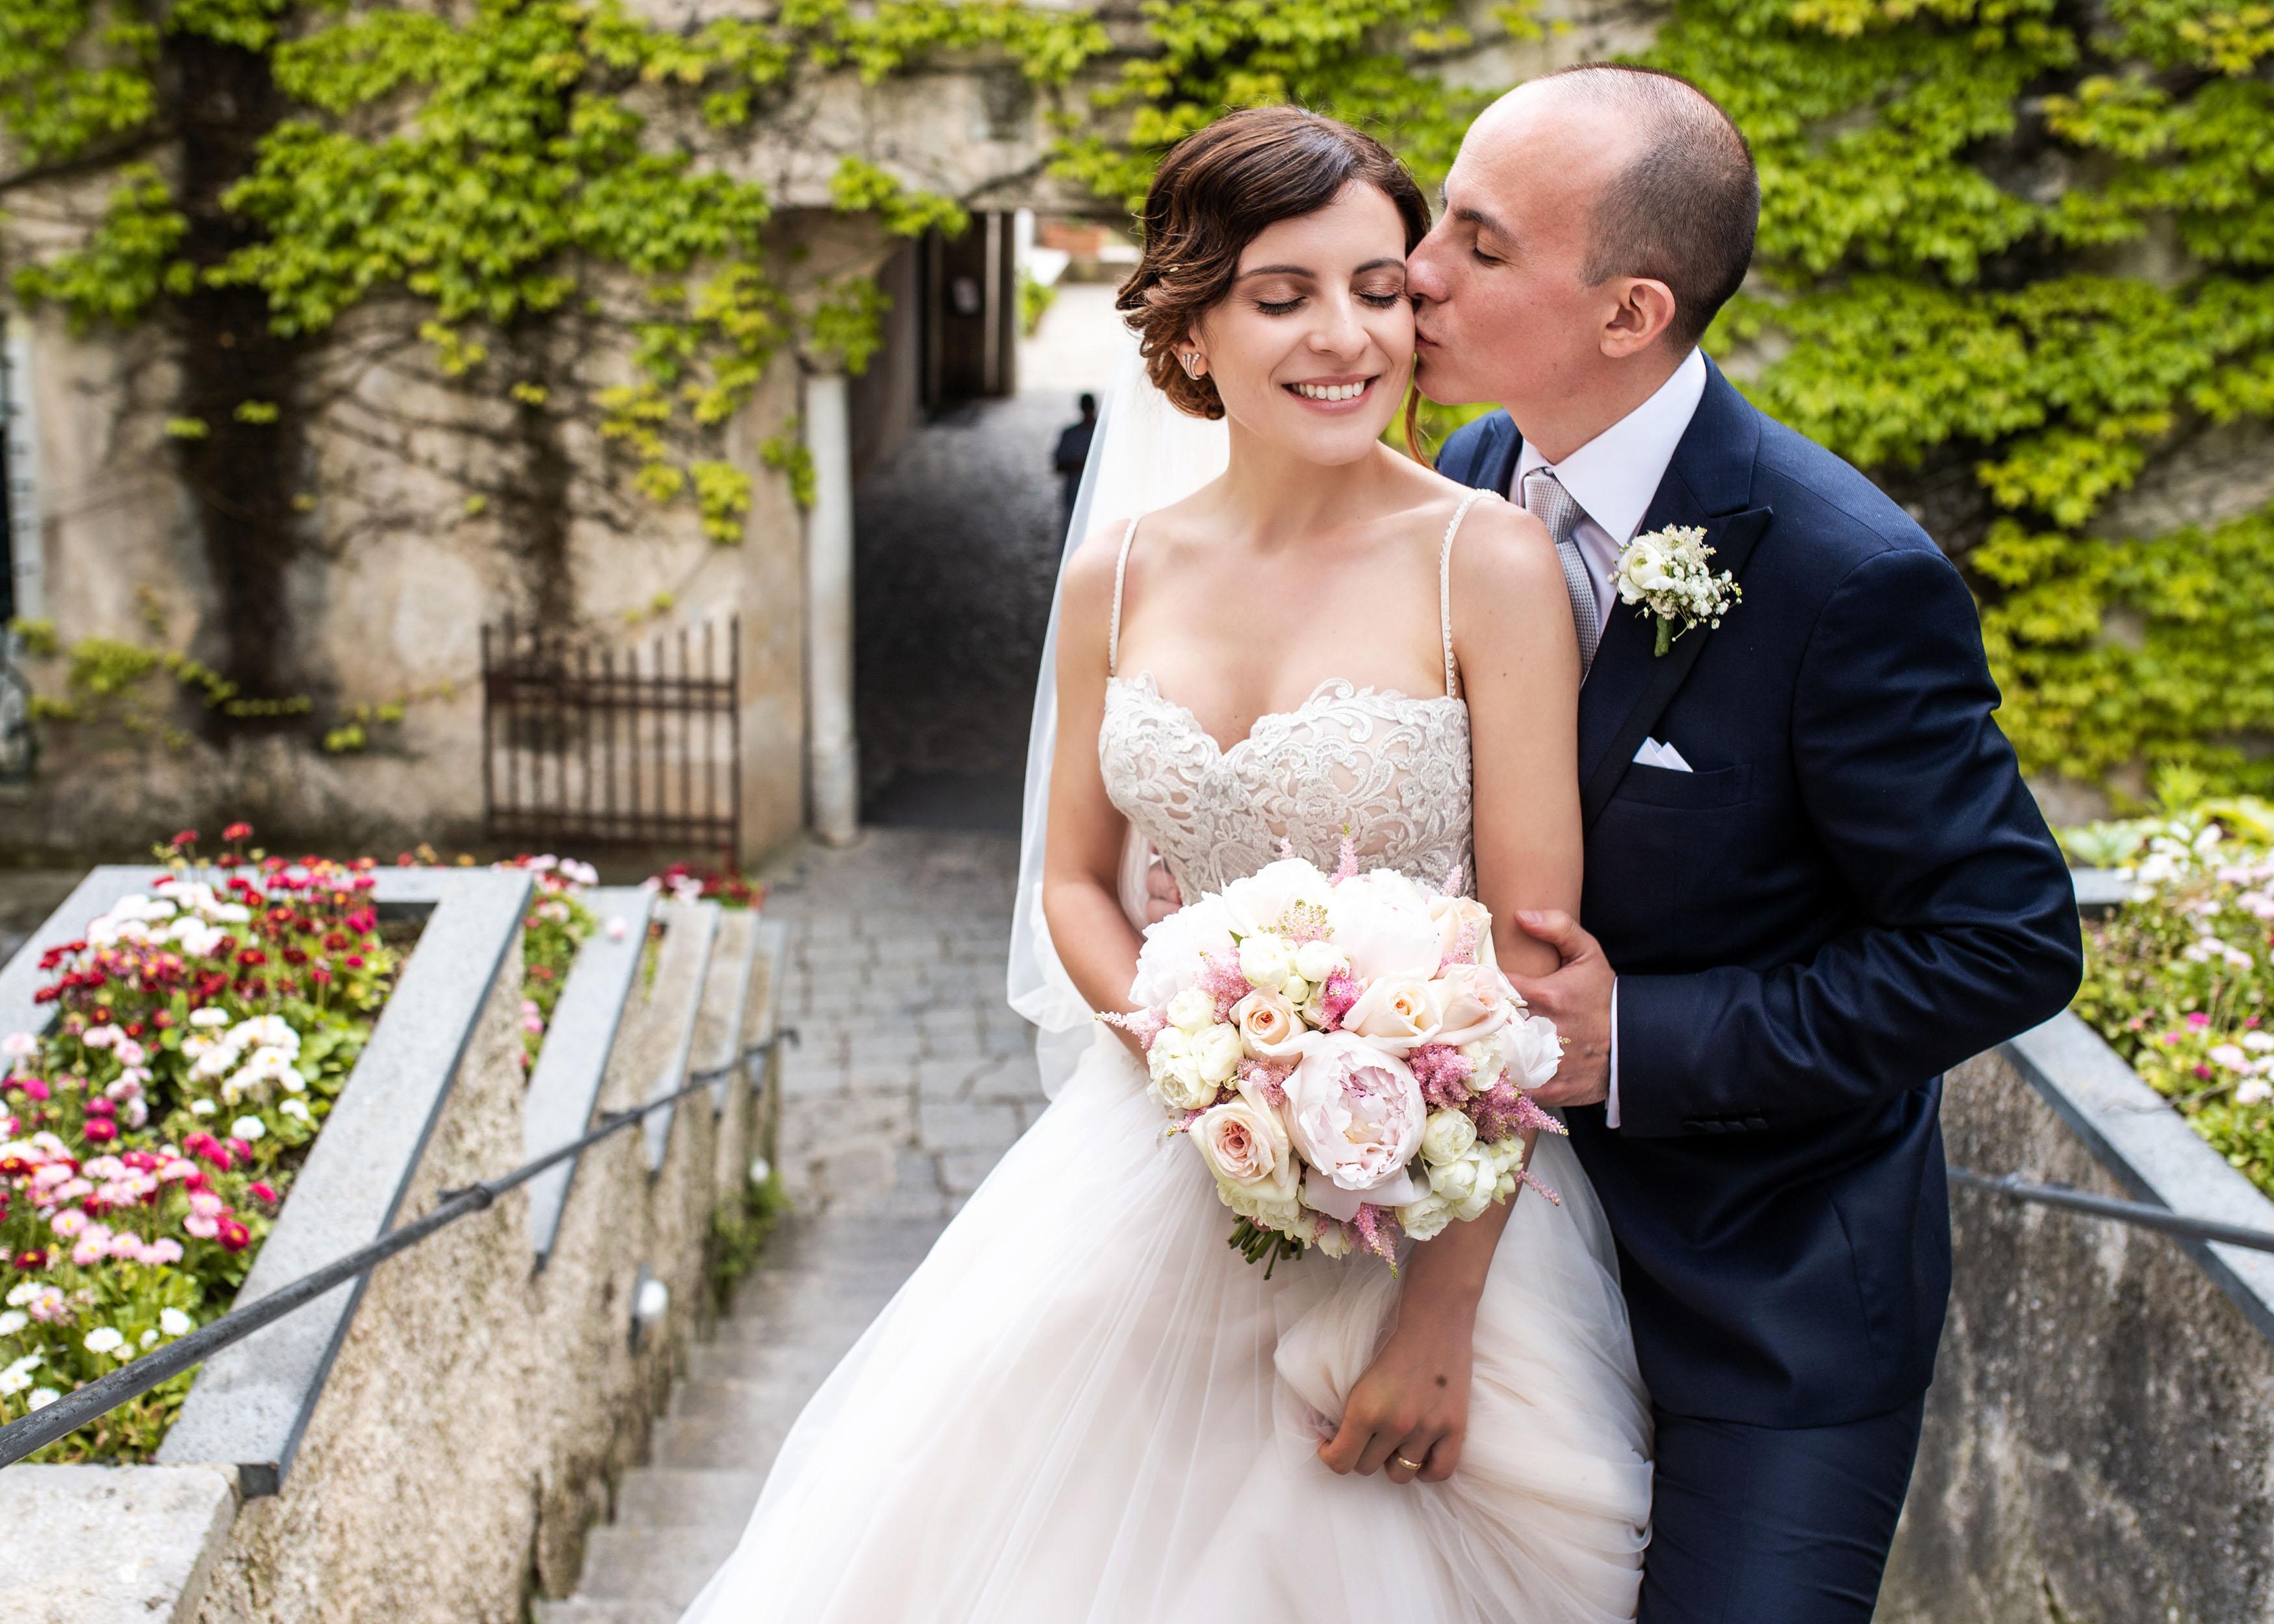 https://www.weddingamalfi.com/wp-content/uploads/Katia-Jorge-18-maggio-2019-34.jpg